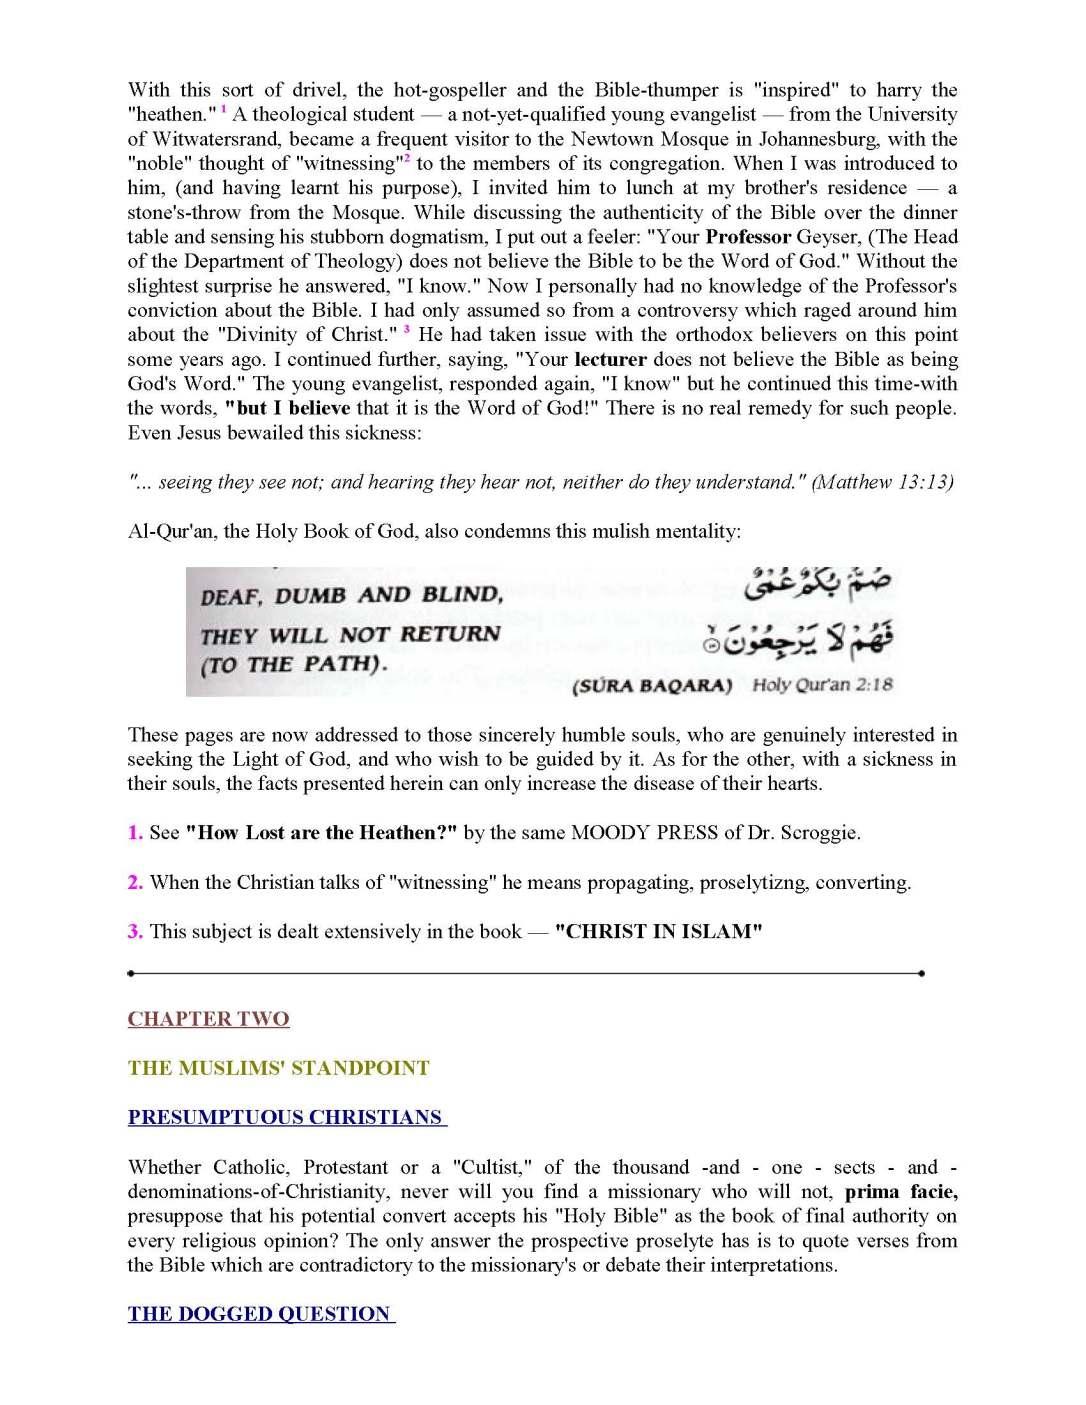 Is The Bible Gods Word [deedat]_Page_02